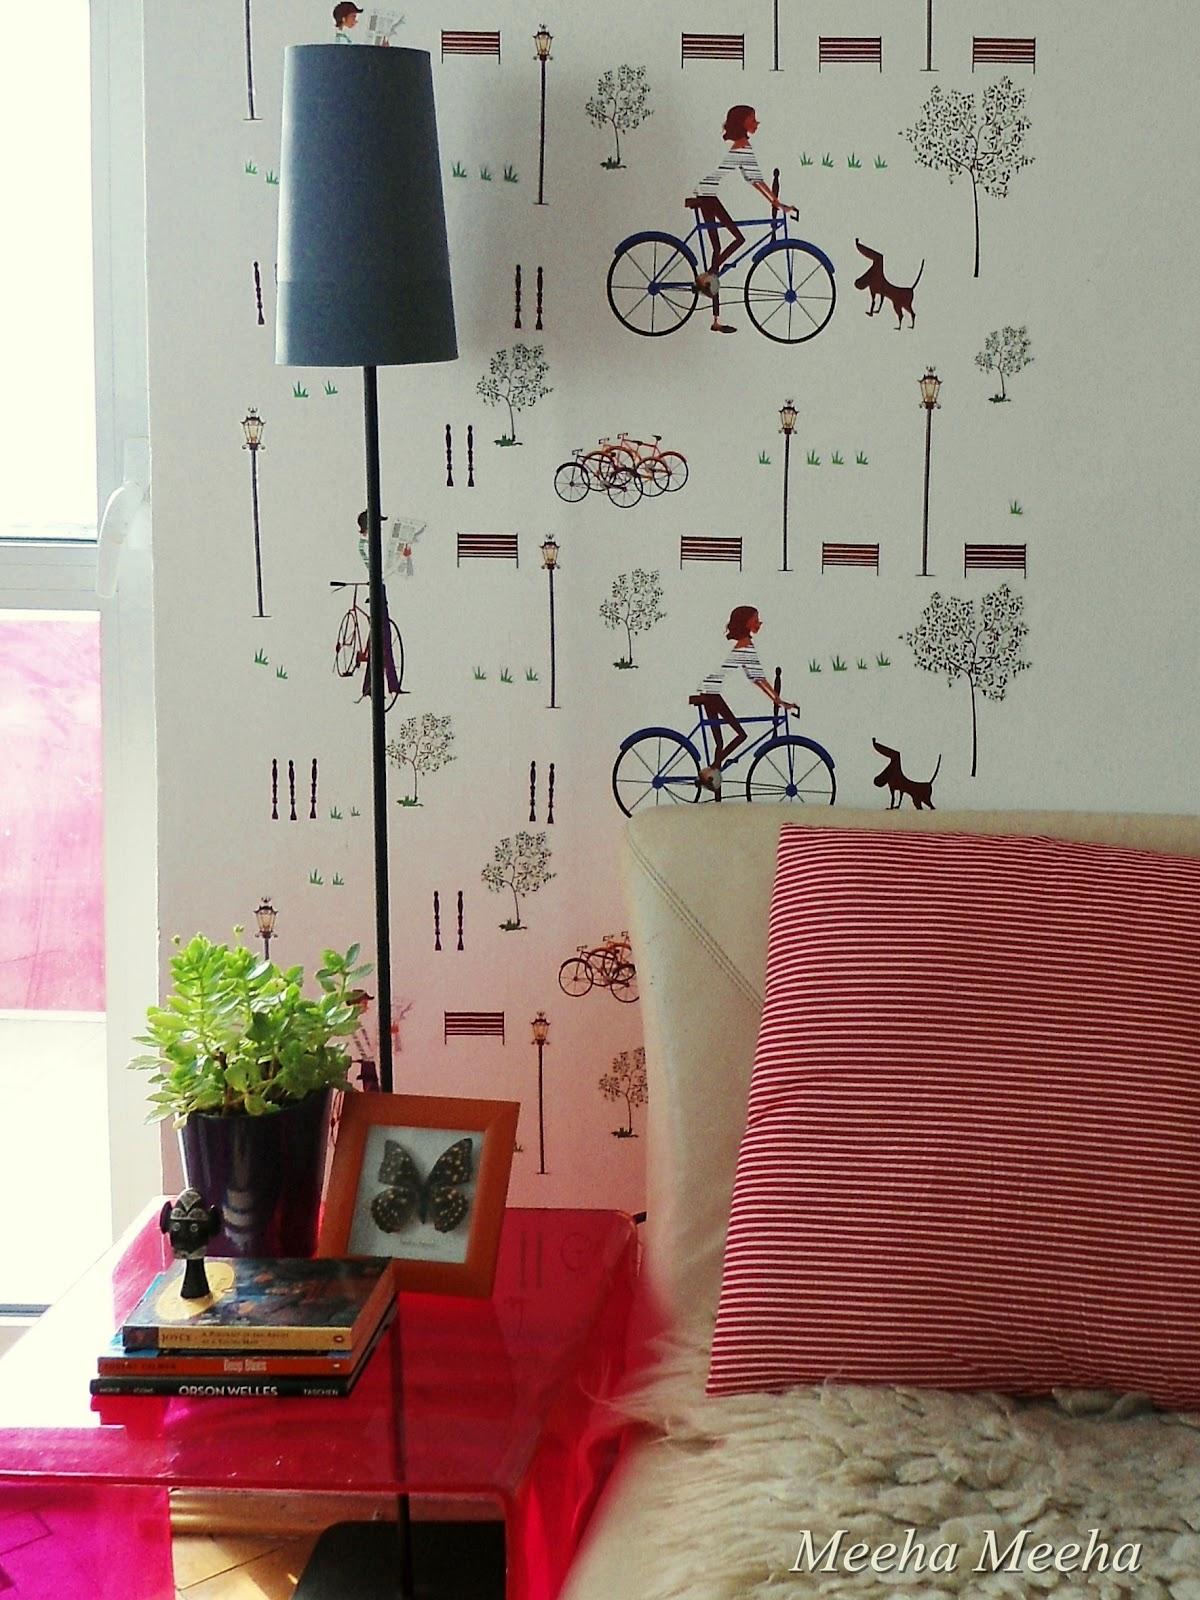 http://4.bp.blogspot.com/-EUf1OqbAwsA/T13-wvEccII/AAAAAAAAA0U/vwC0SCLRSxg/s1600/faux+wallpaper+20.JPG